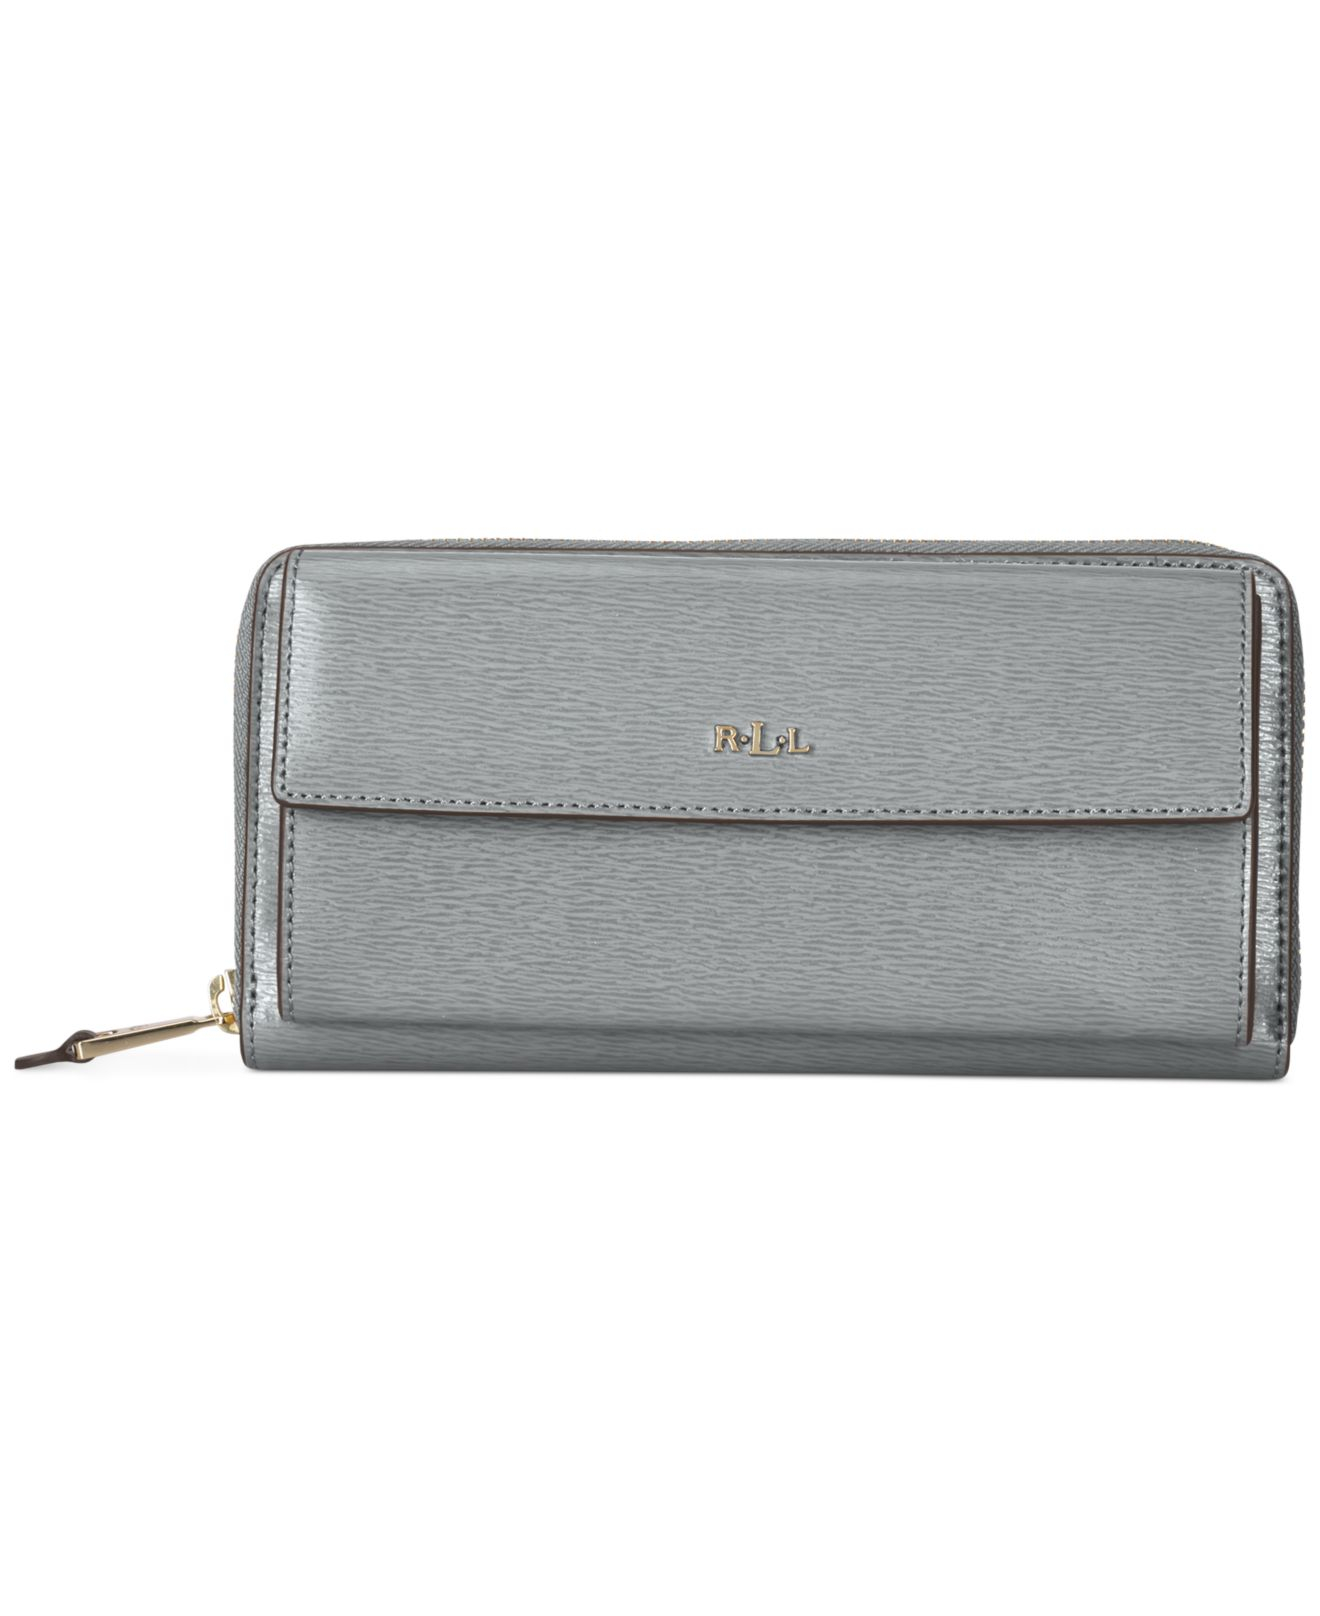 Lyst - Lauren by Ralph Lauren Tate Pocket Zip Wallet in Gray 6208a8f3fc